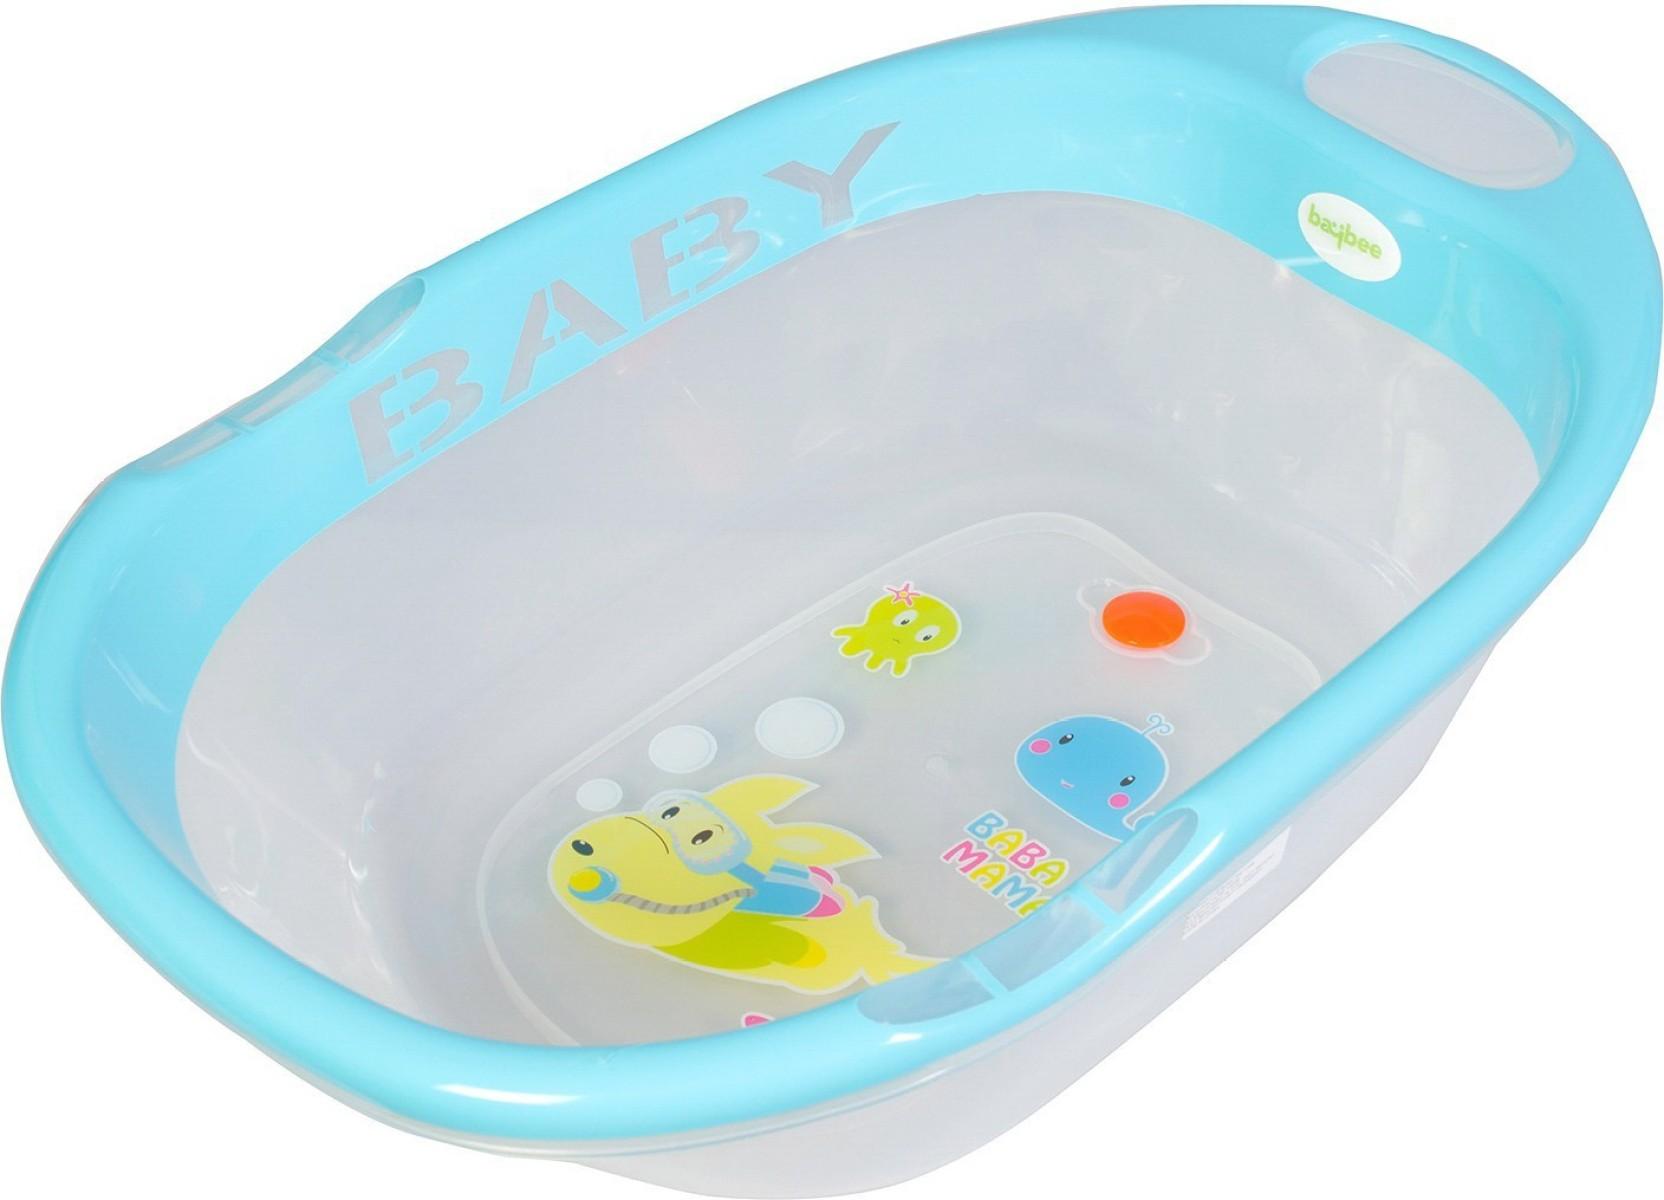 Baybee Gaara Bath tub Newborn to 18 month Price in India - Buy ...